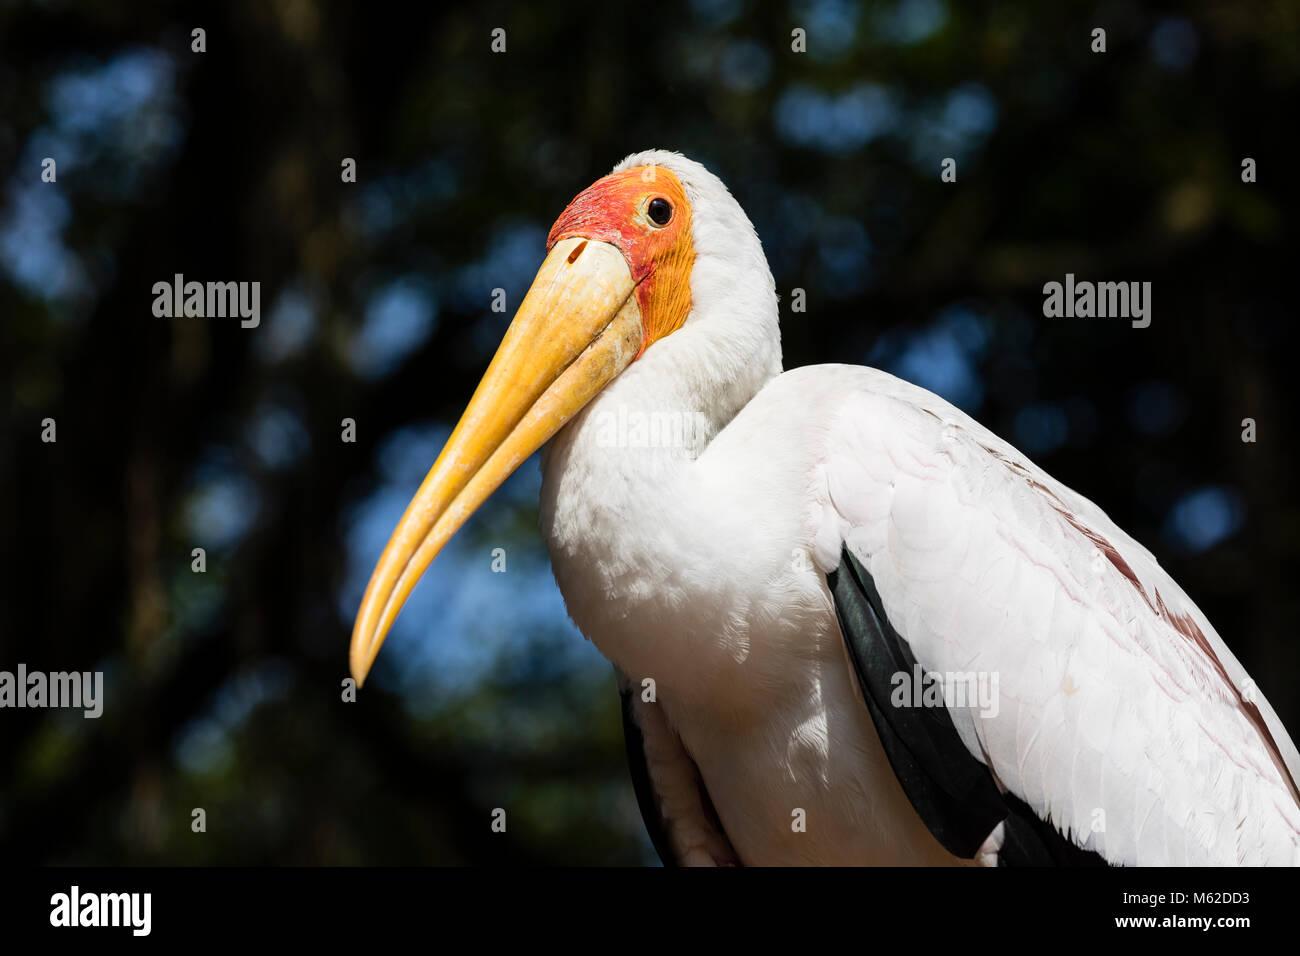 Yellow-billed Stork (Mycteria ibis) with closed beak - Stock Image